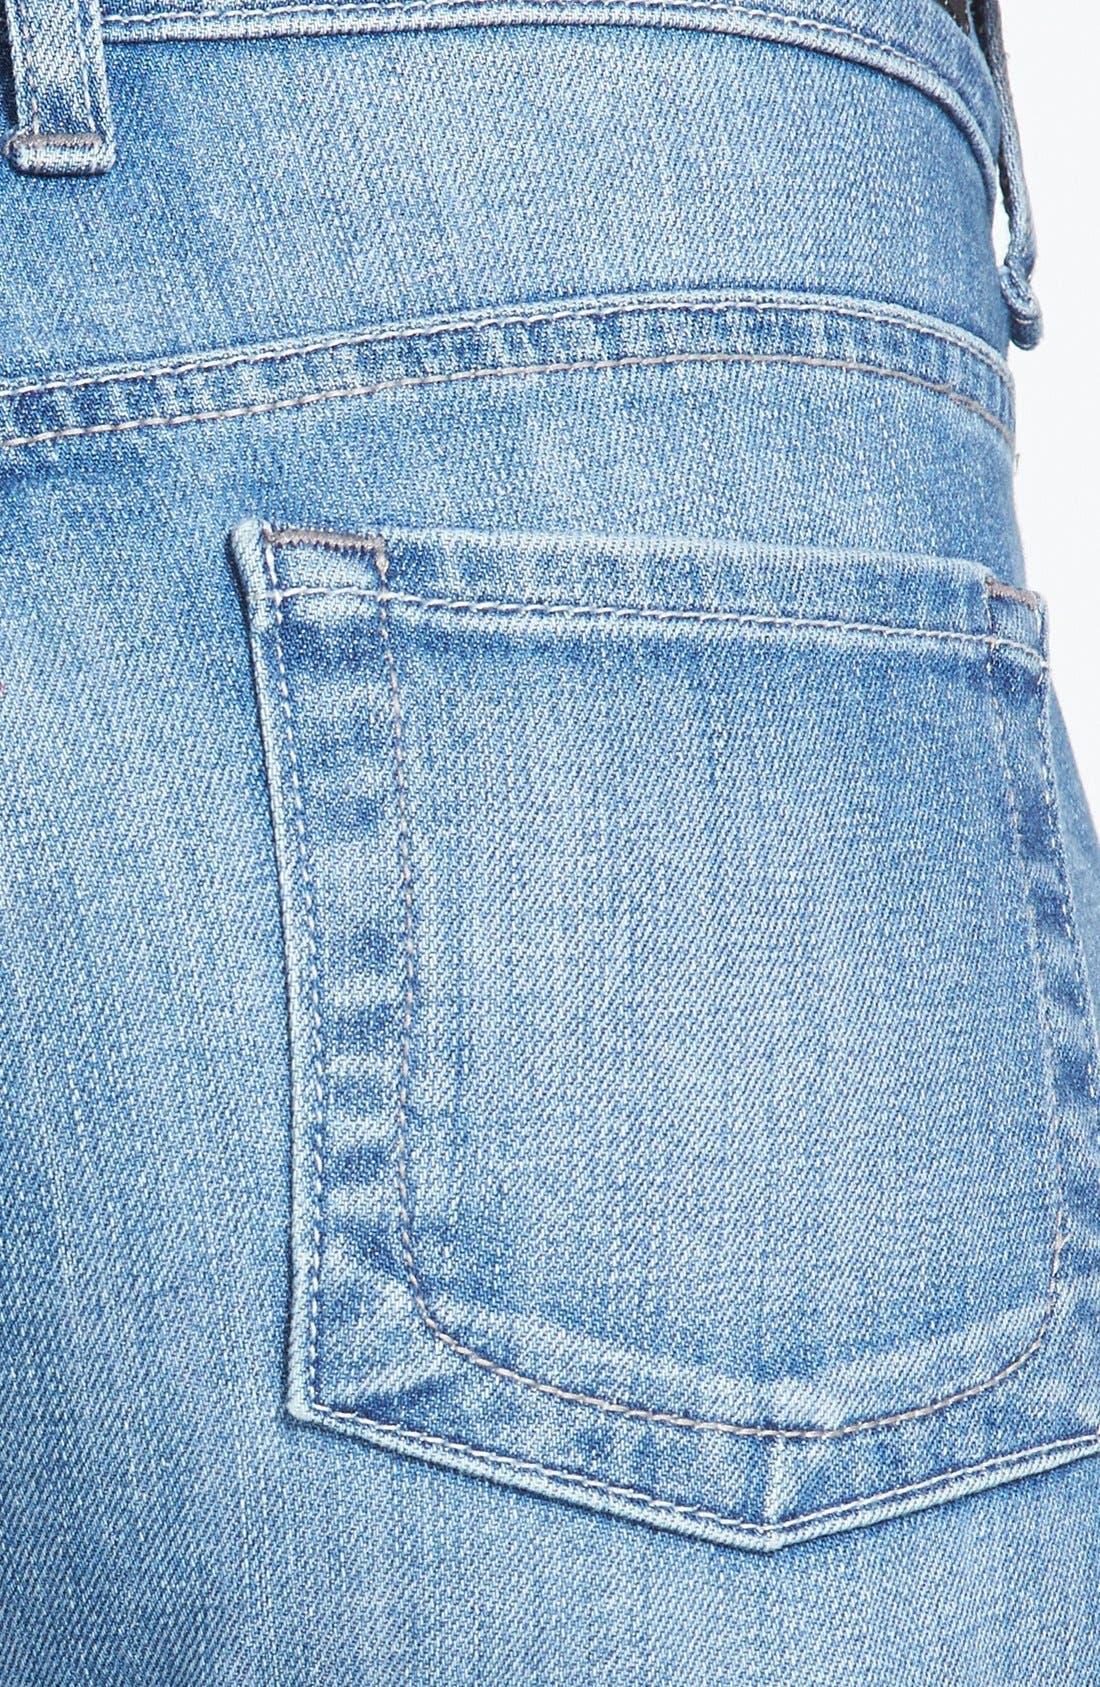 Alternate Image 3  - KUT from the Kloth 'Catherine' Slim Boyfriend Jeans (Exceptional) (Regular & Petite)